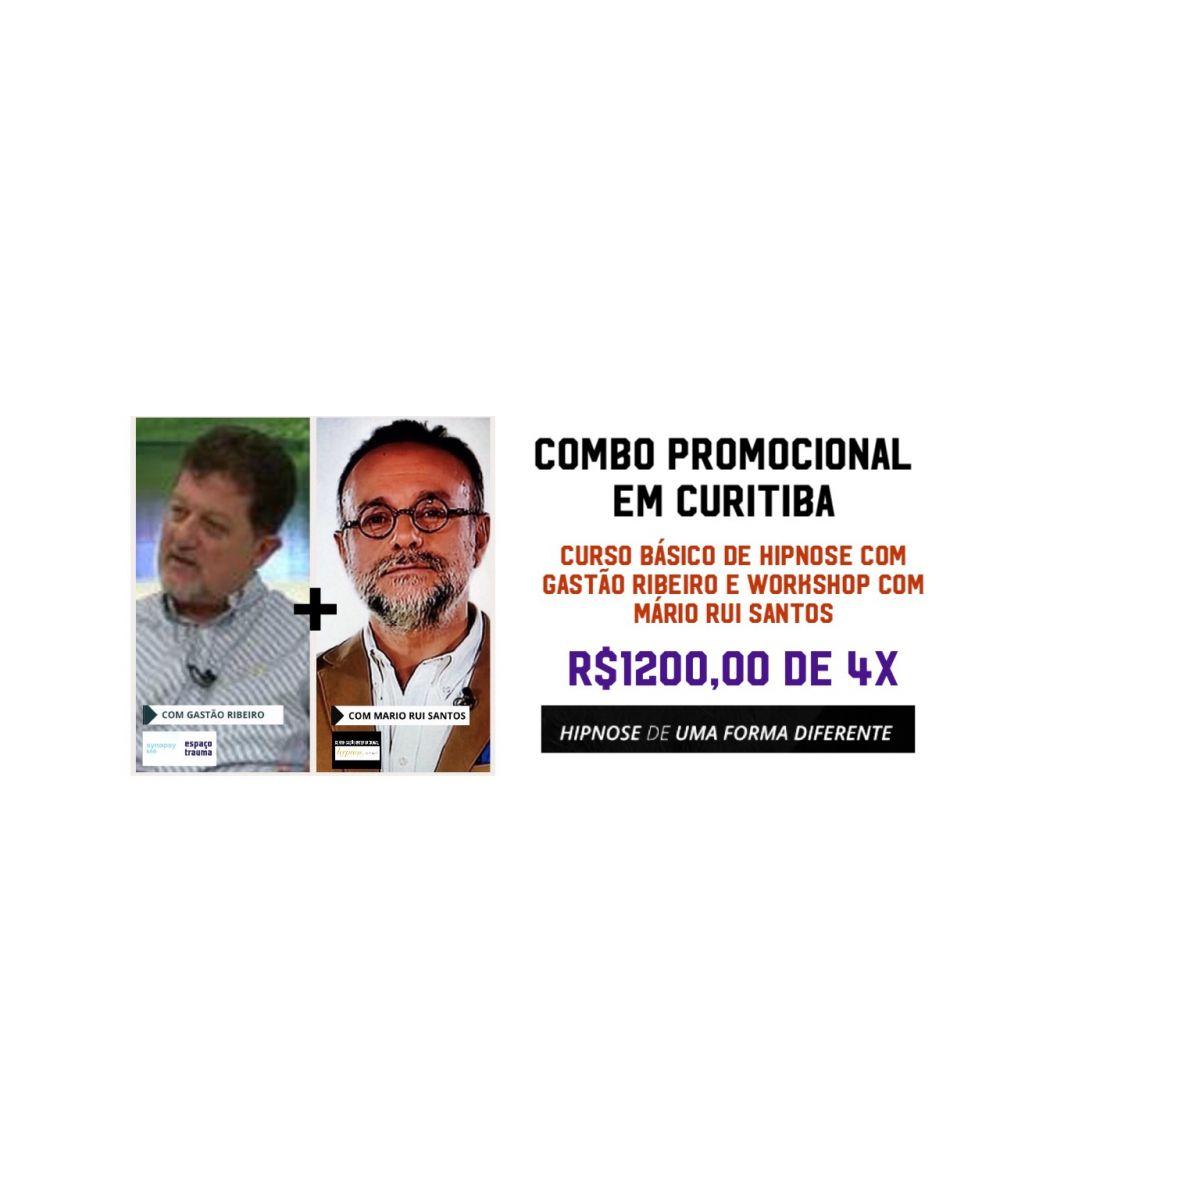 Combo Promocional de Curitiba - Workshop e Curso de Hipnose Básico